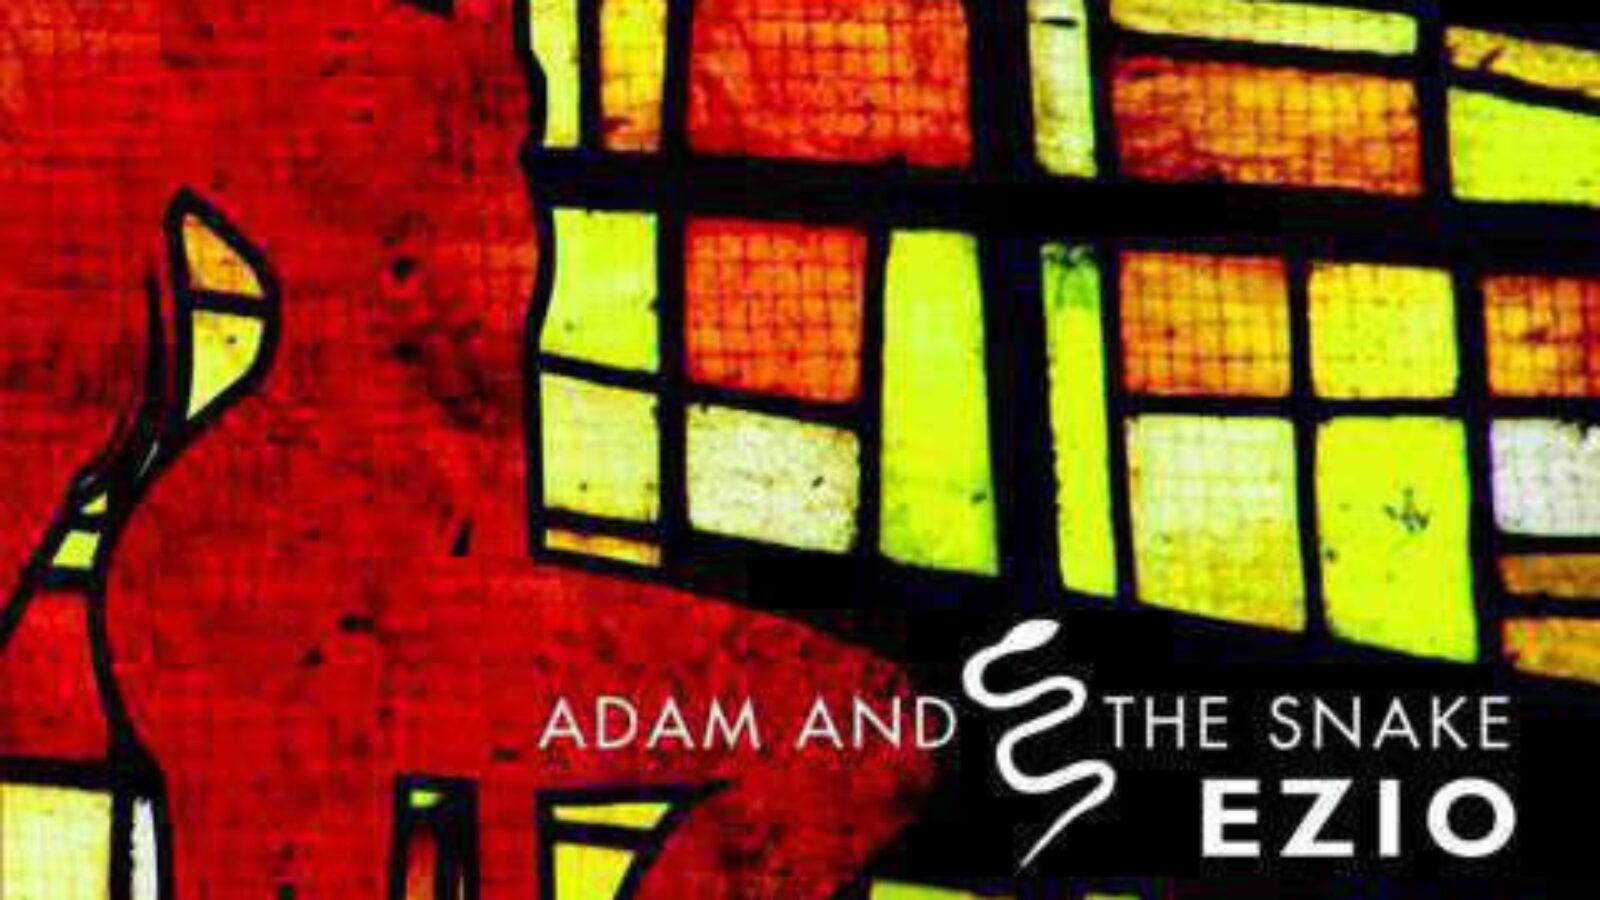 EZIO Adam And The Snake